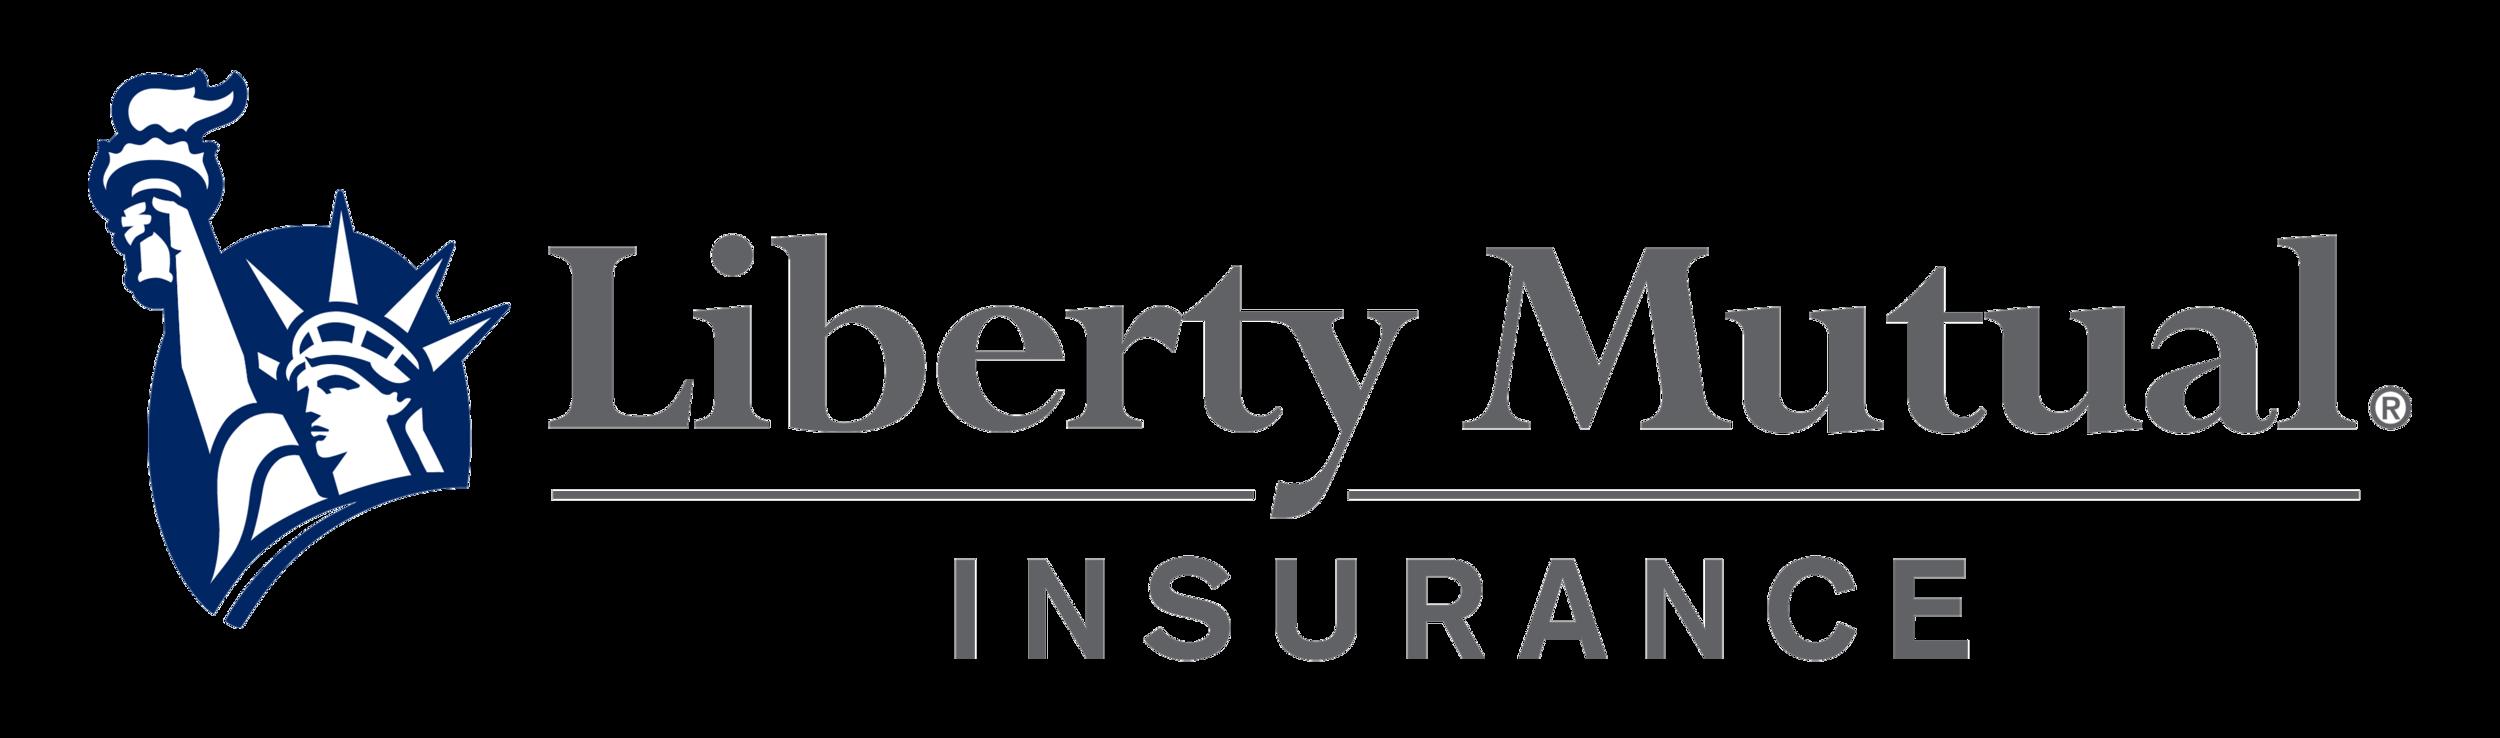 purepng.com-liberty-mutual-insurance-logologobrand-logoiconslogos-2515199396954pqyu.png